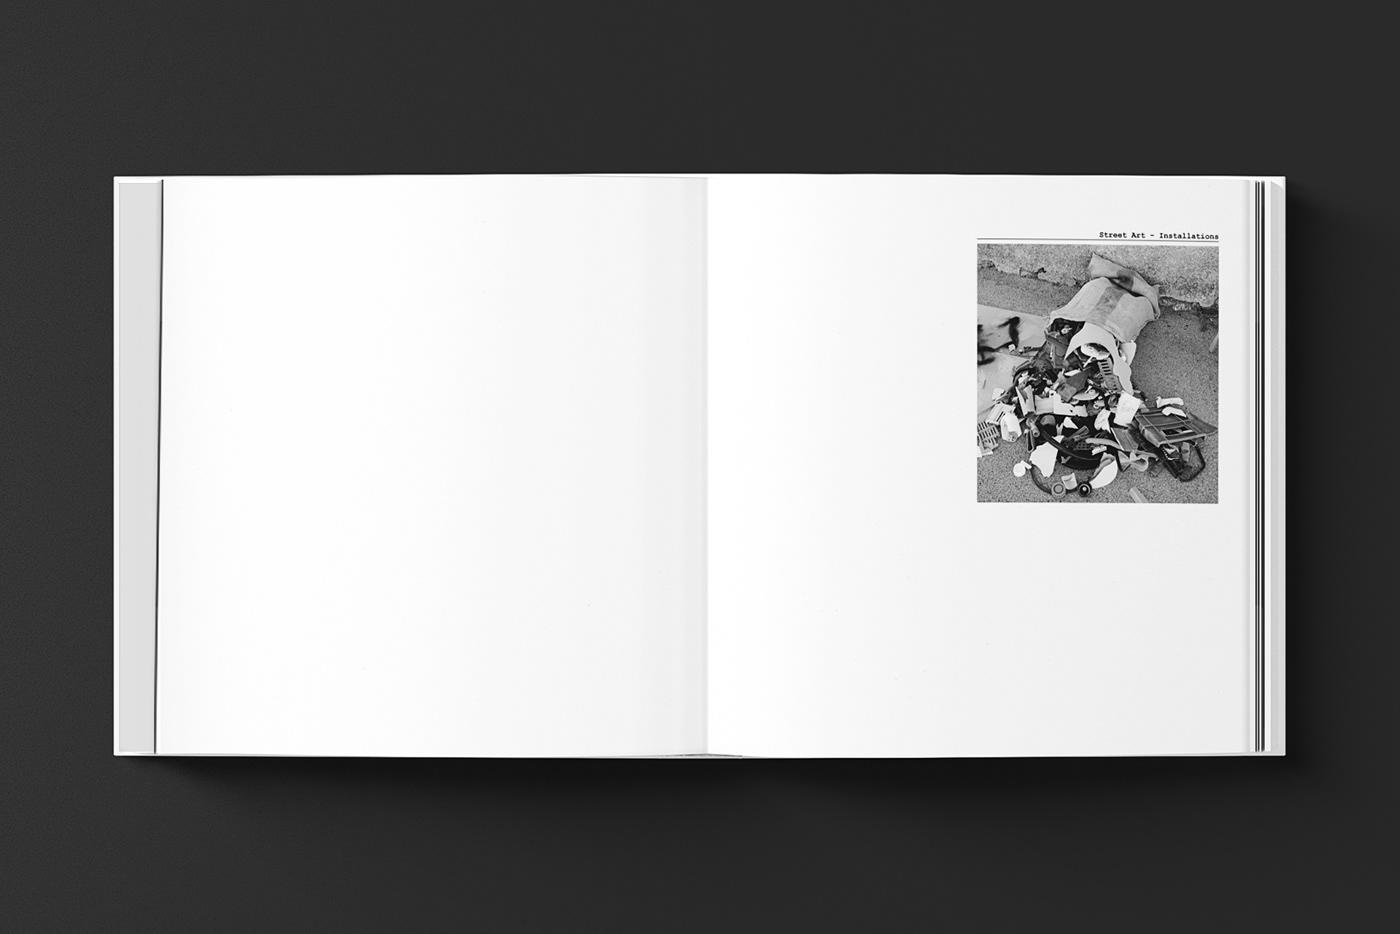 publishing  ,e-book,ILLUSTRATION ,blurb,Editing ,Catalogue,Printing,typography